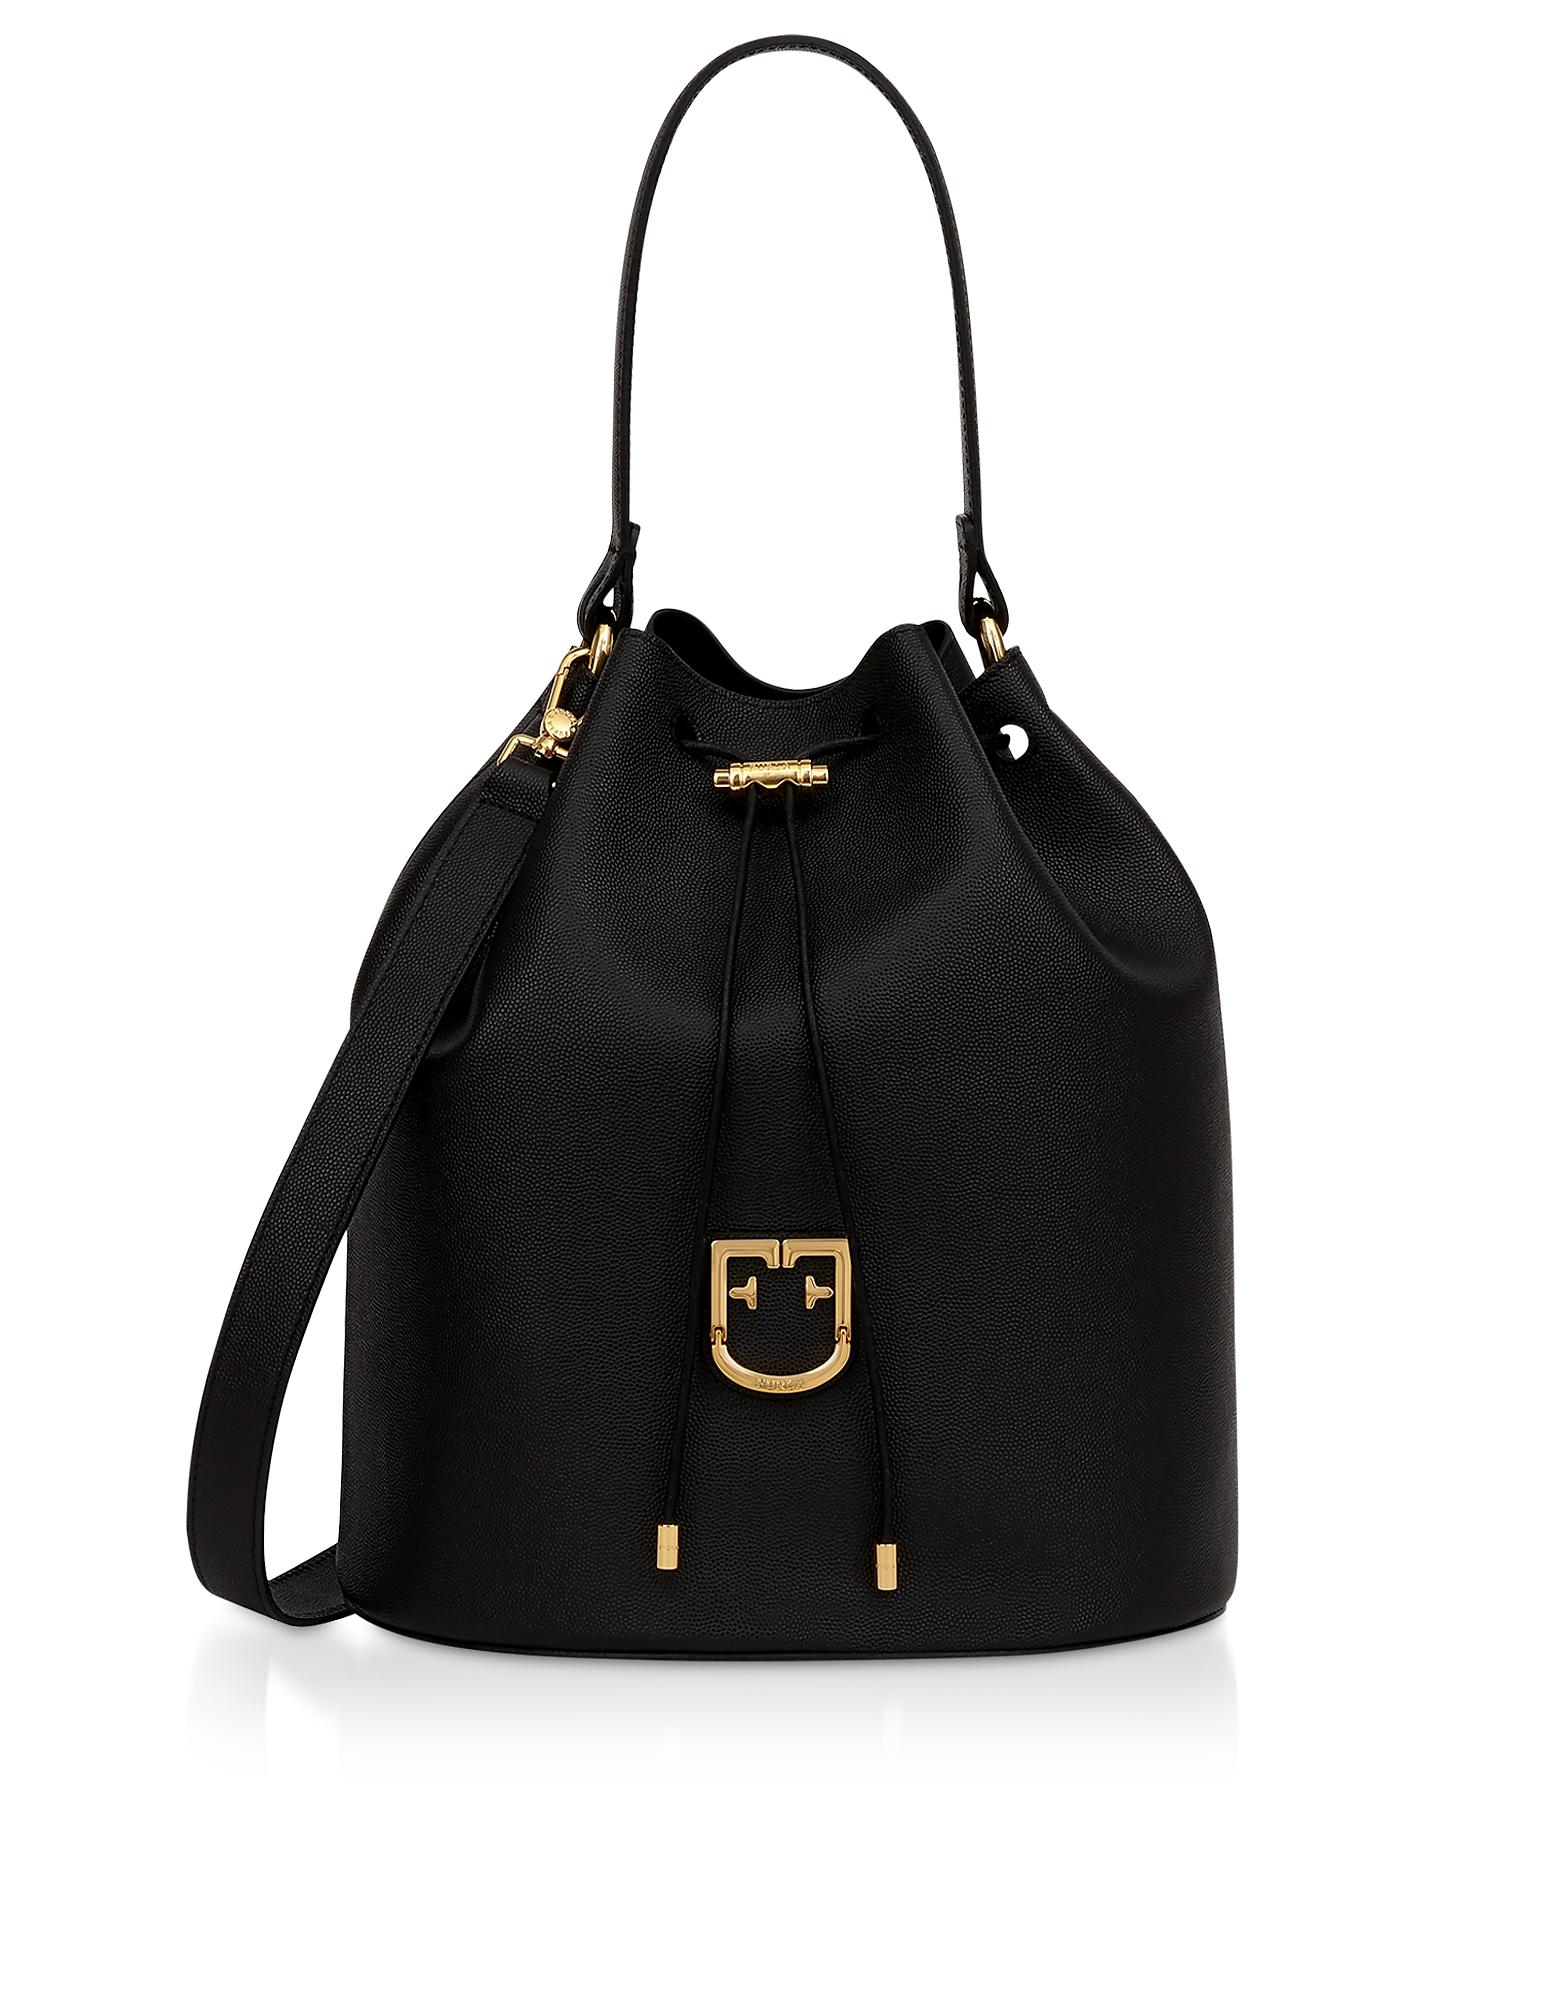 Corona M Drawstring Leather Bucket Bag